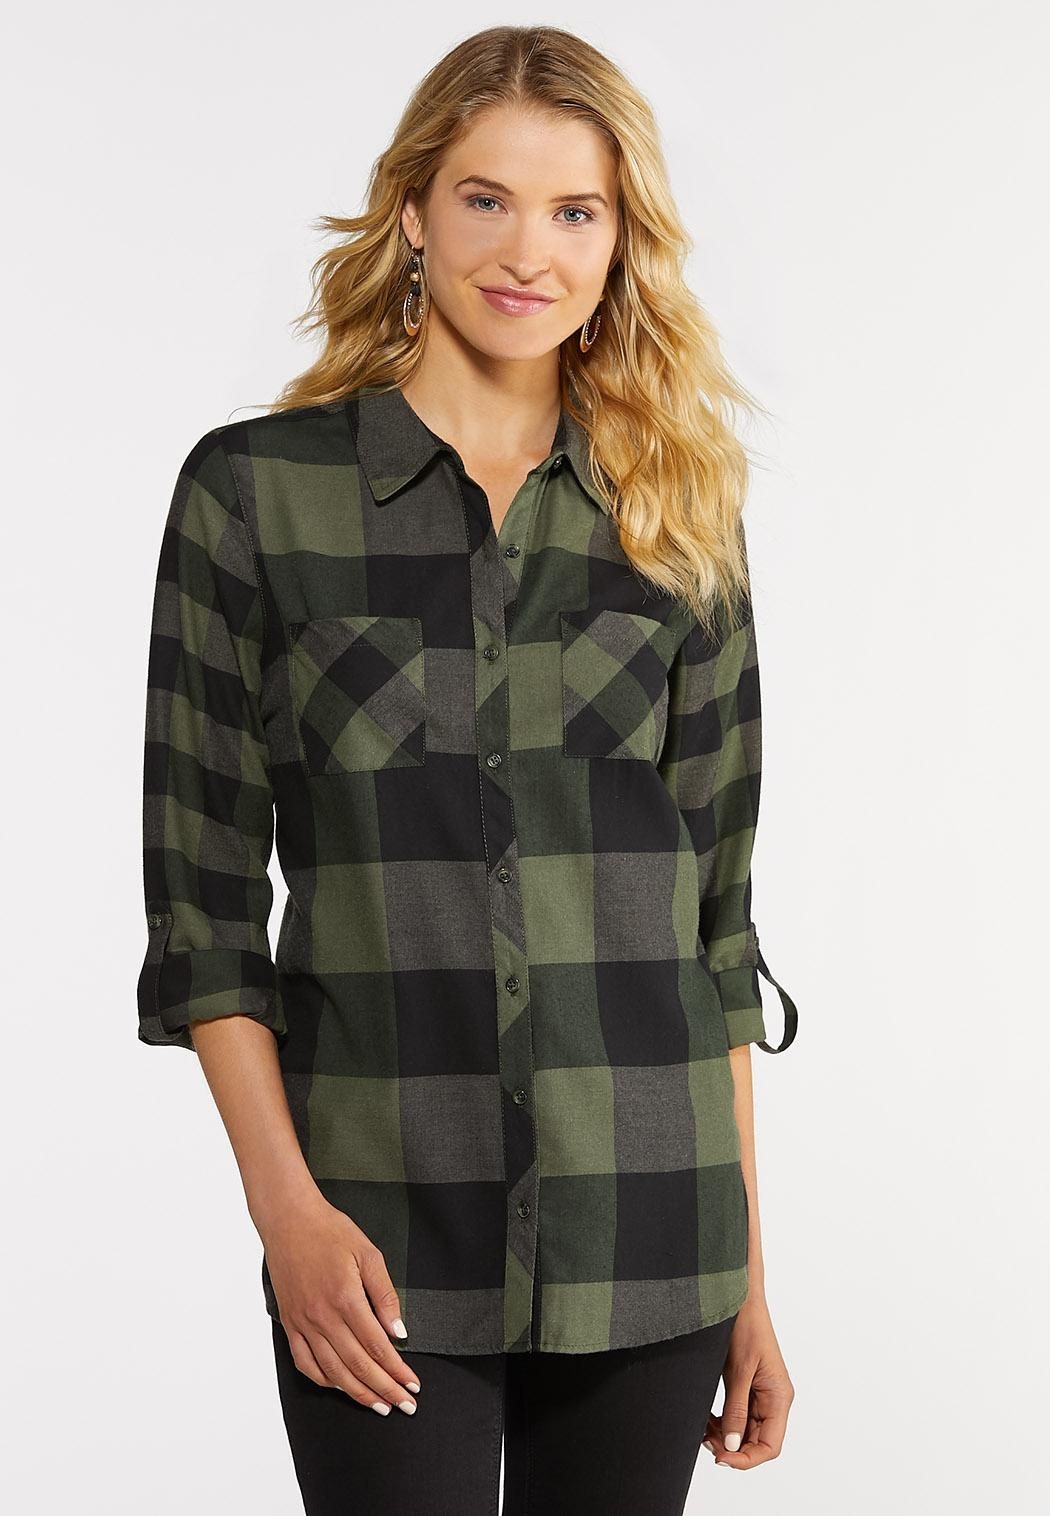 Black And Green Plaid Shirt